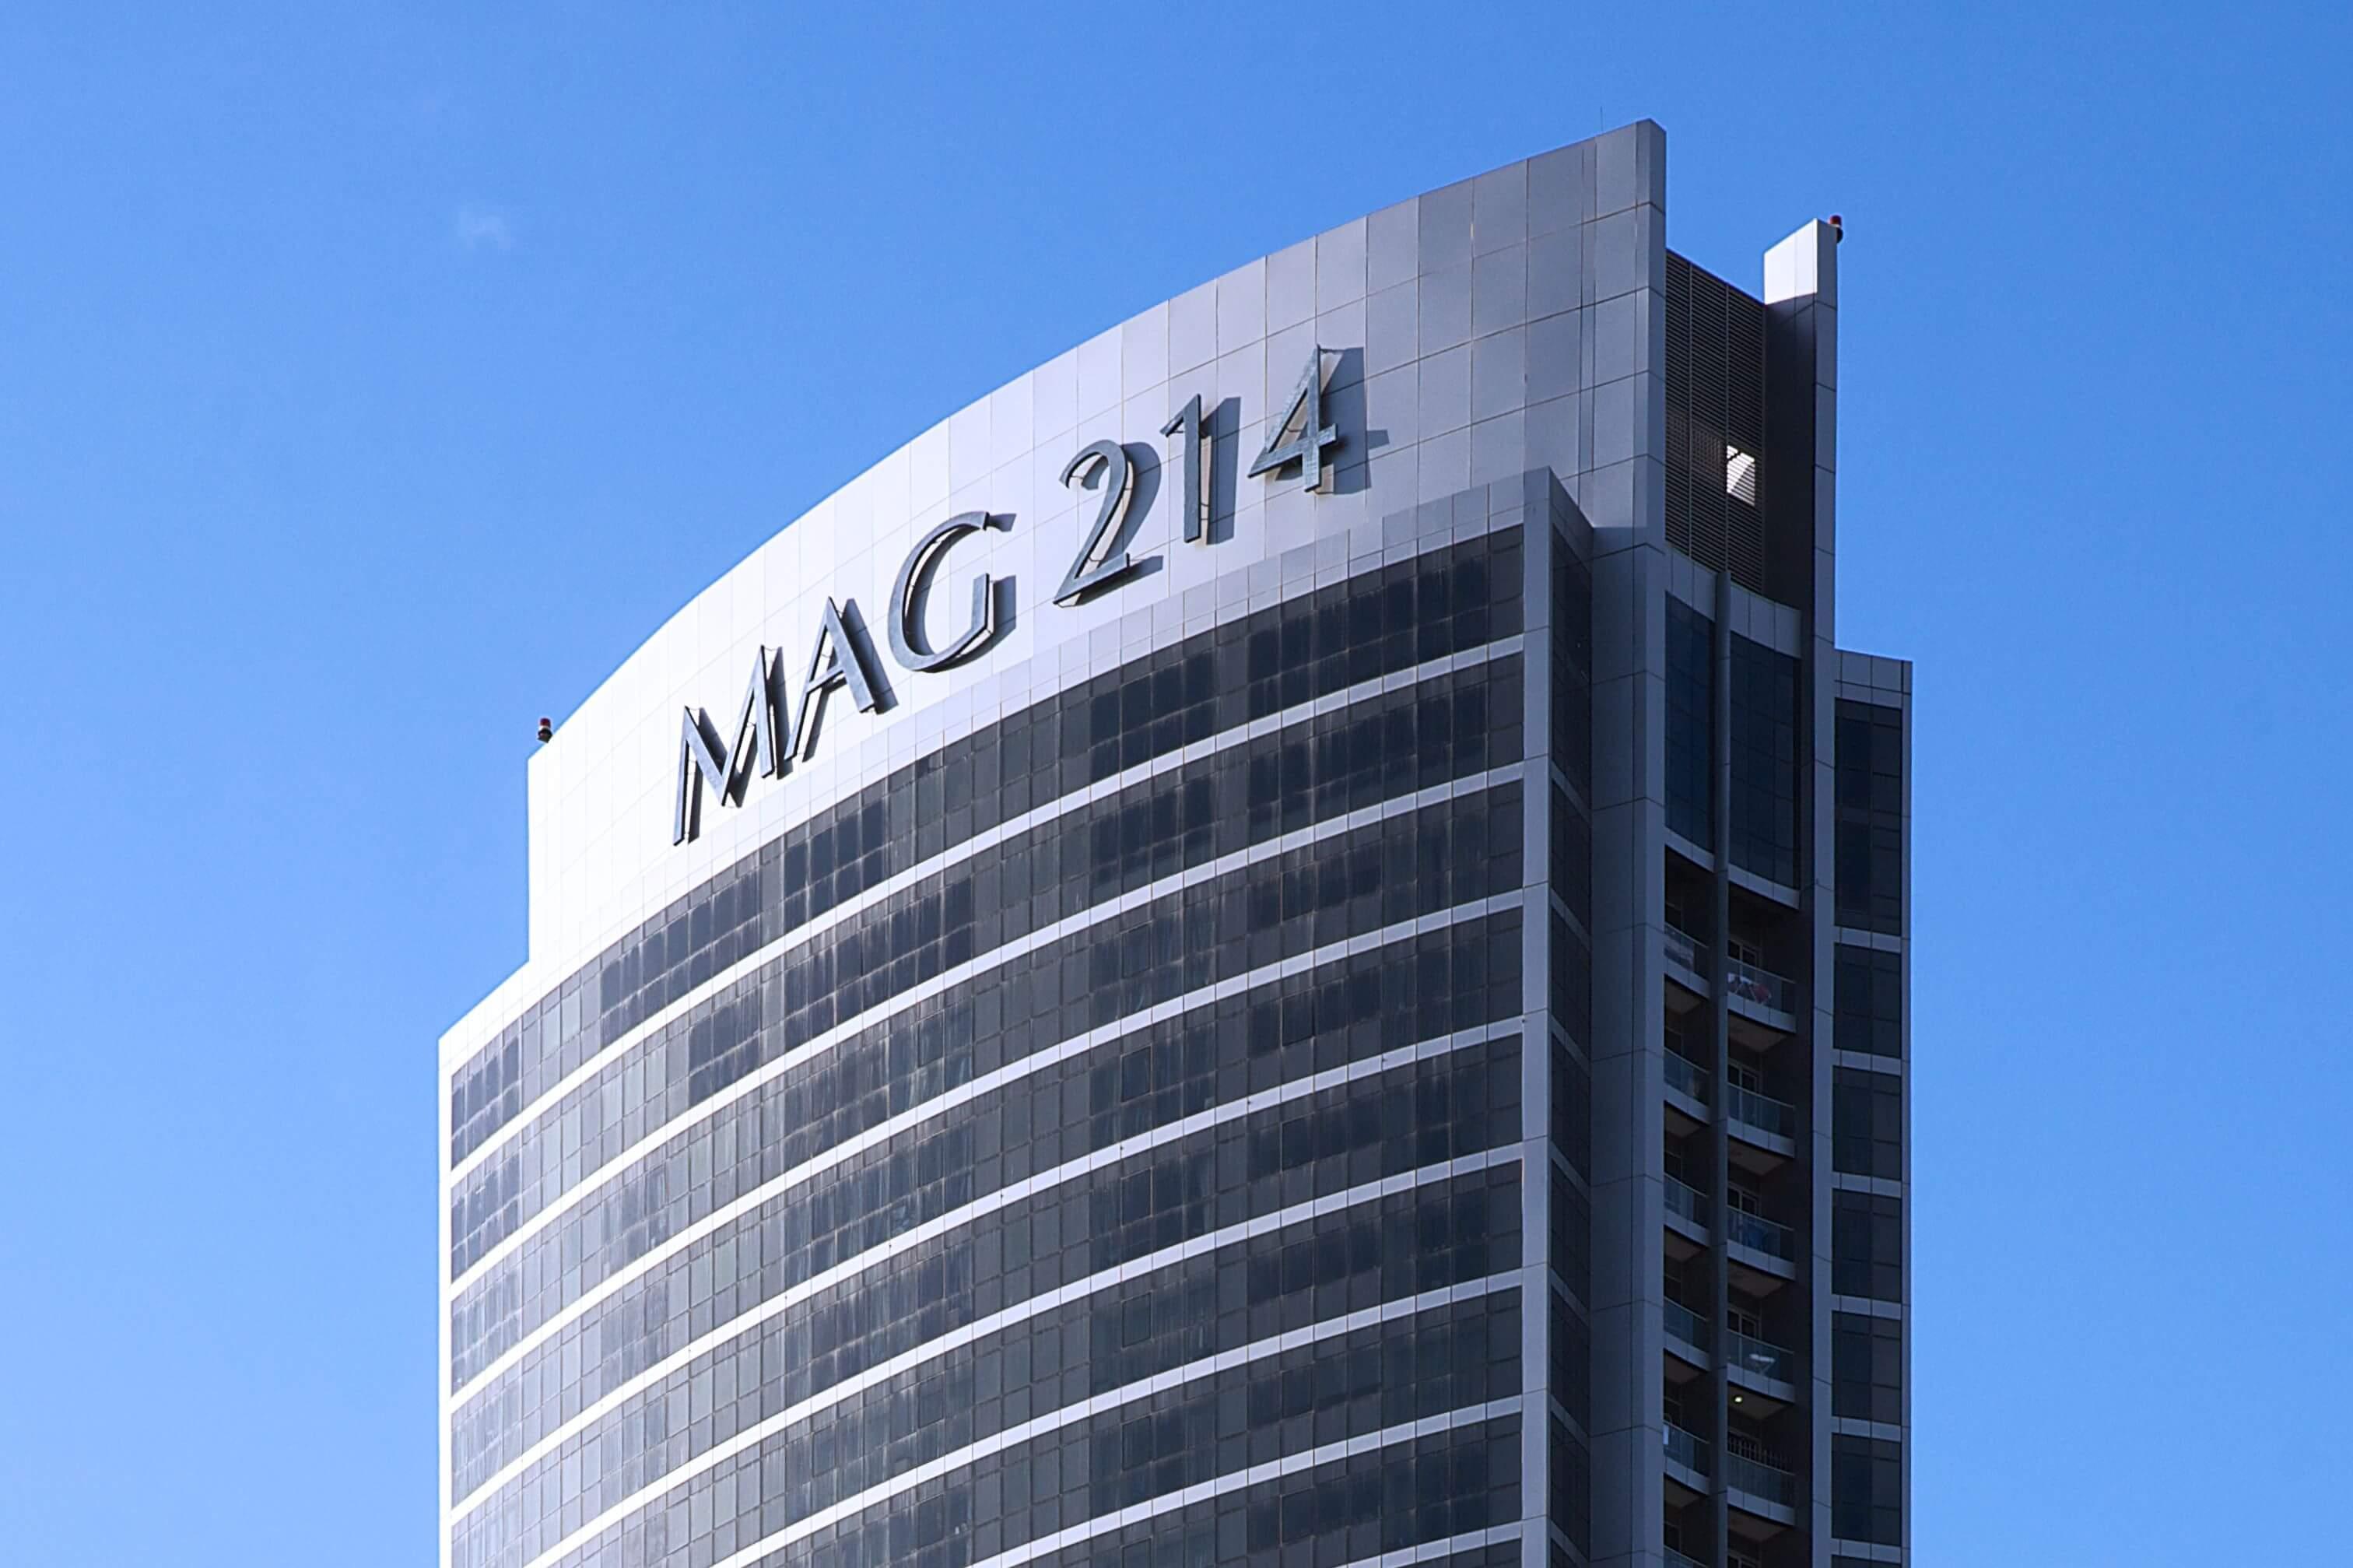 MAG 214